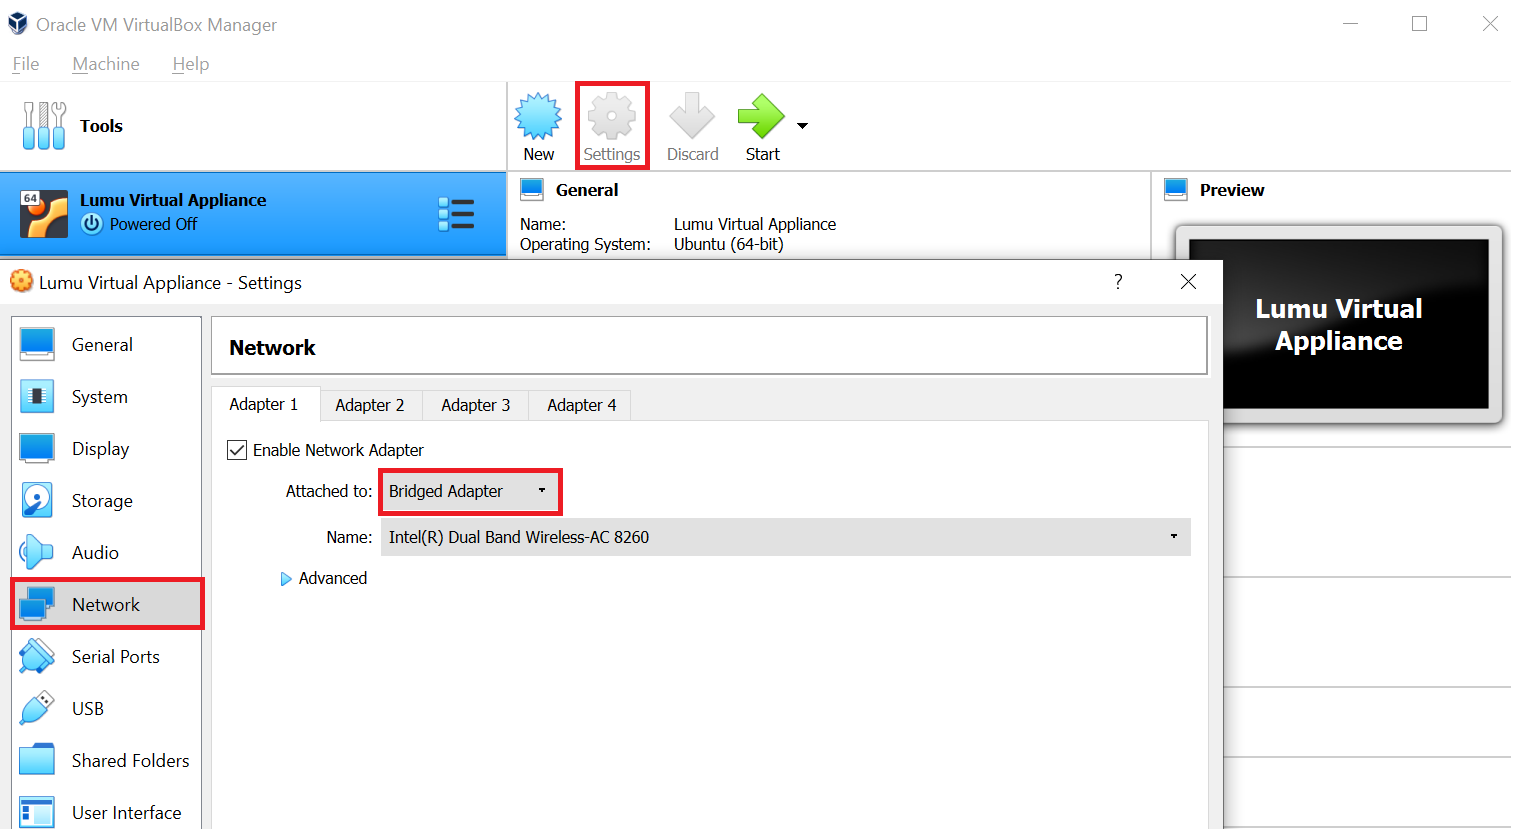 VirtualBox appliance network settings